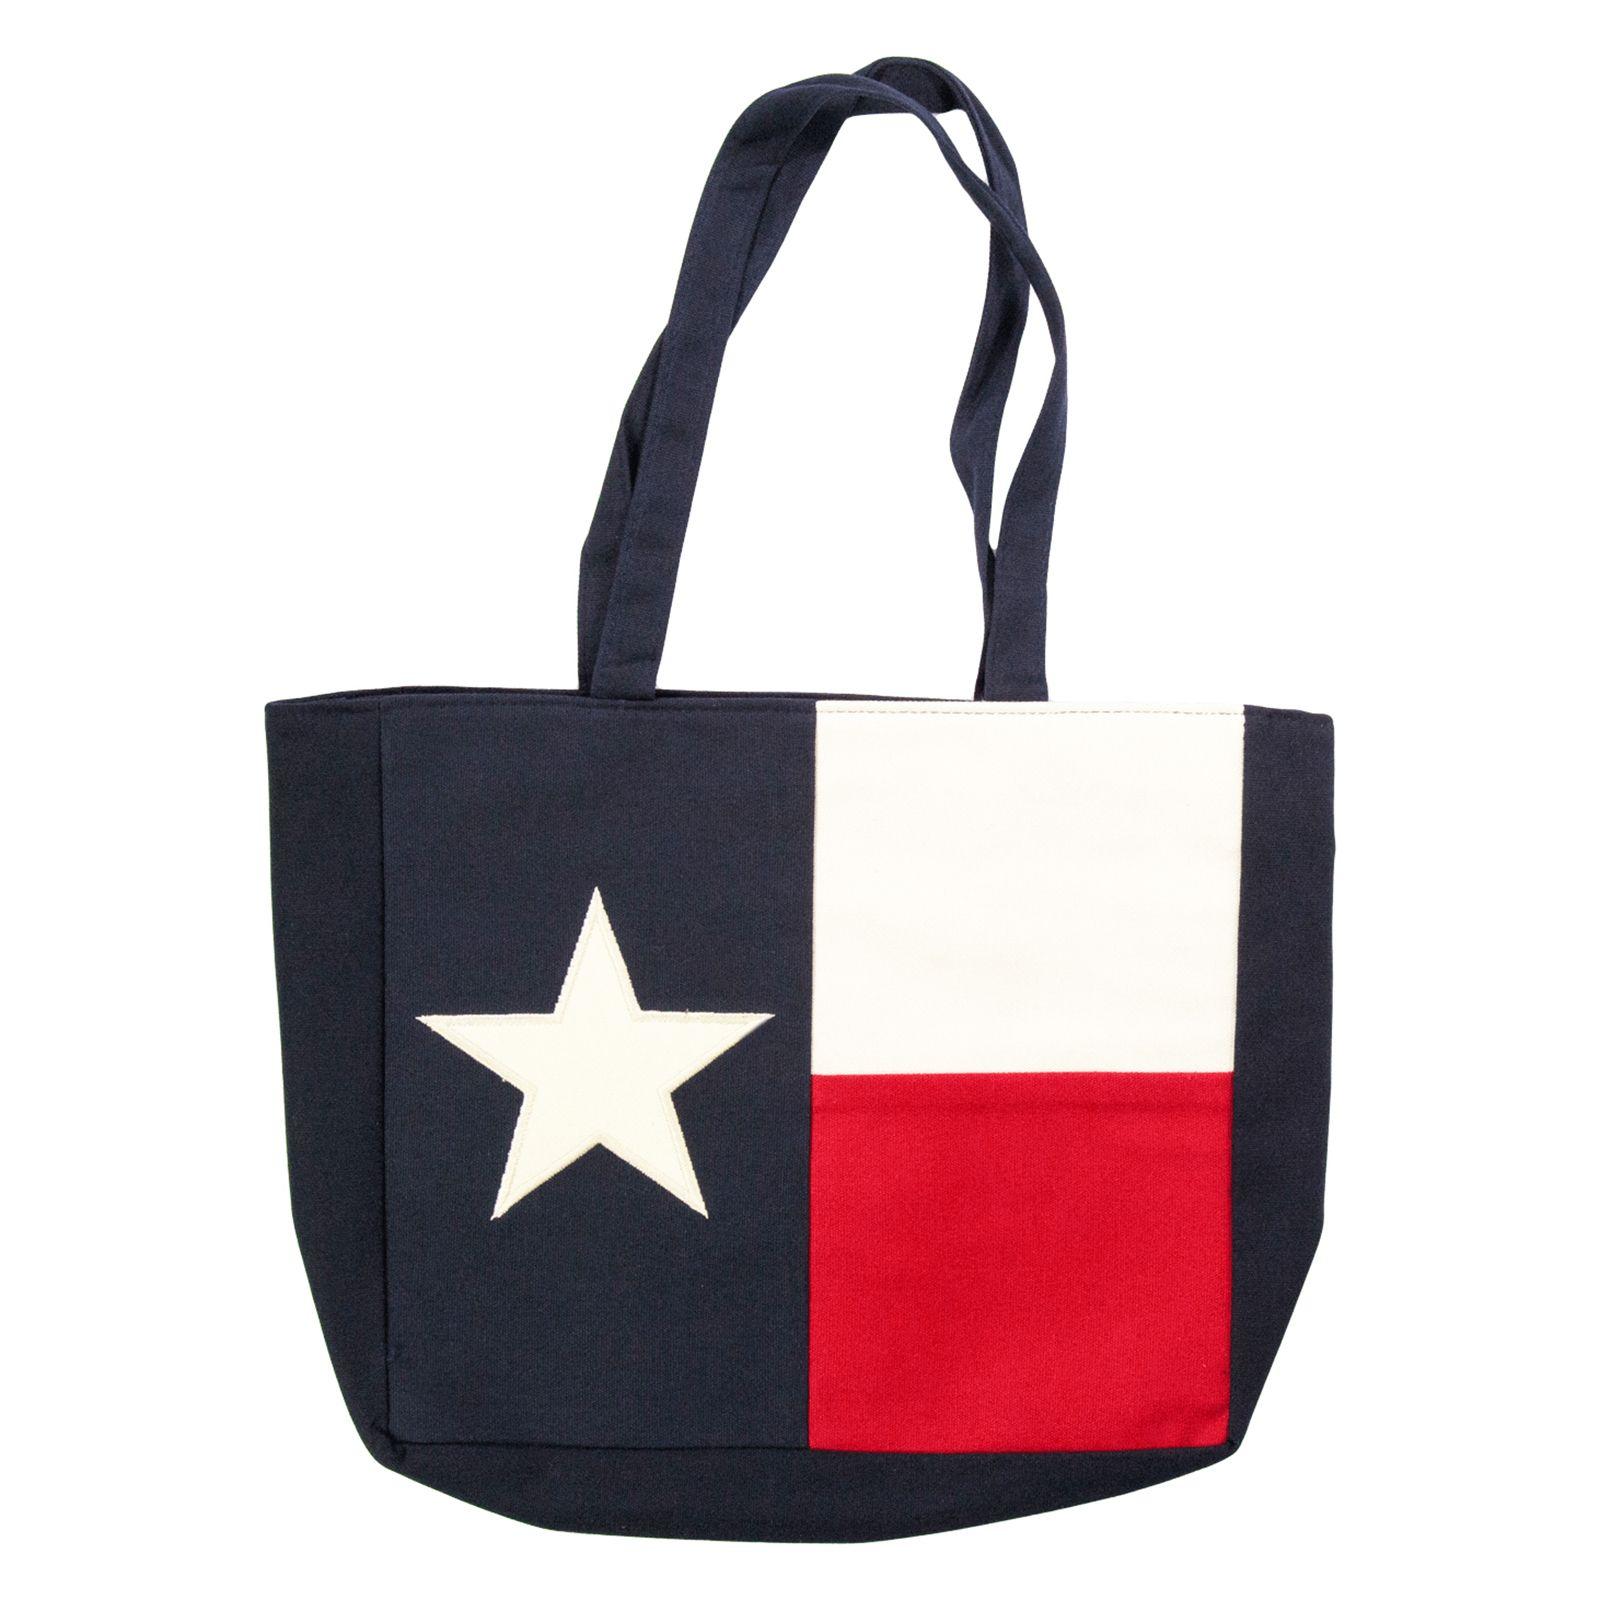 Texas Tote Bag